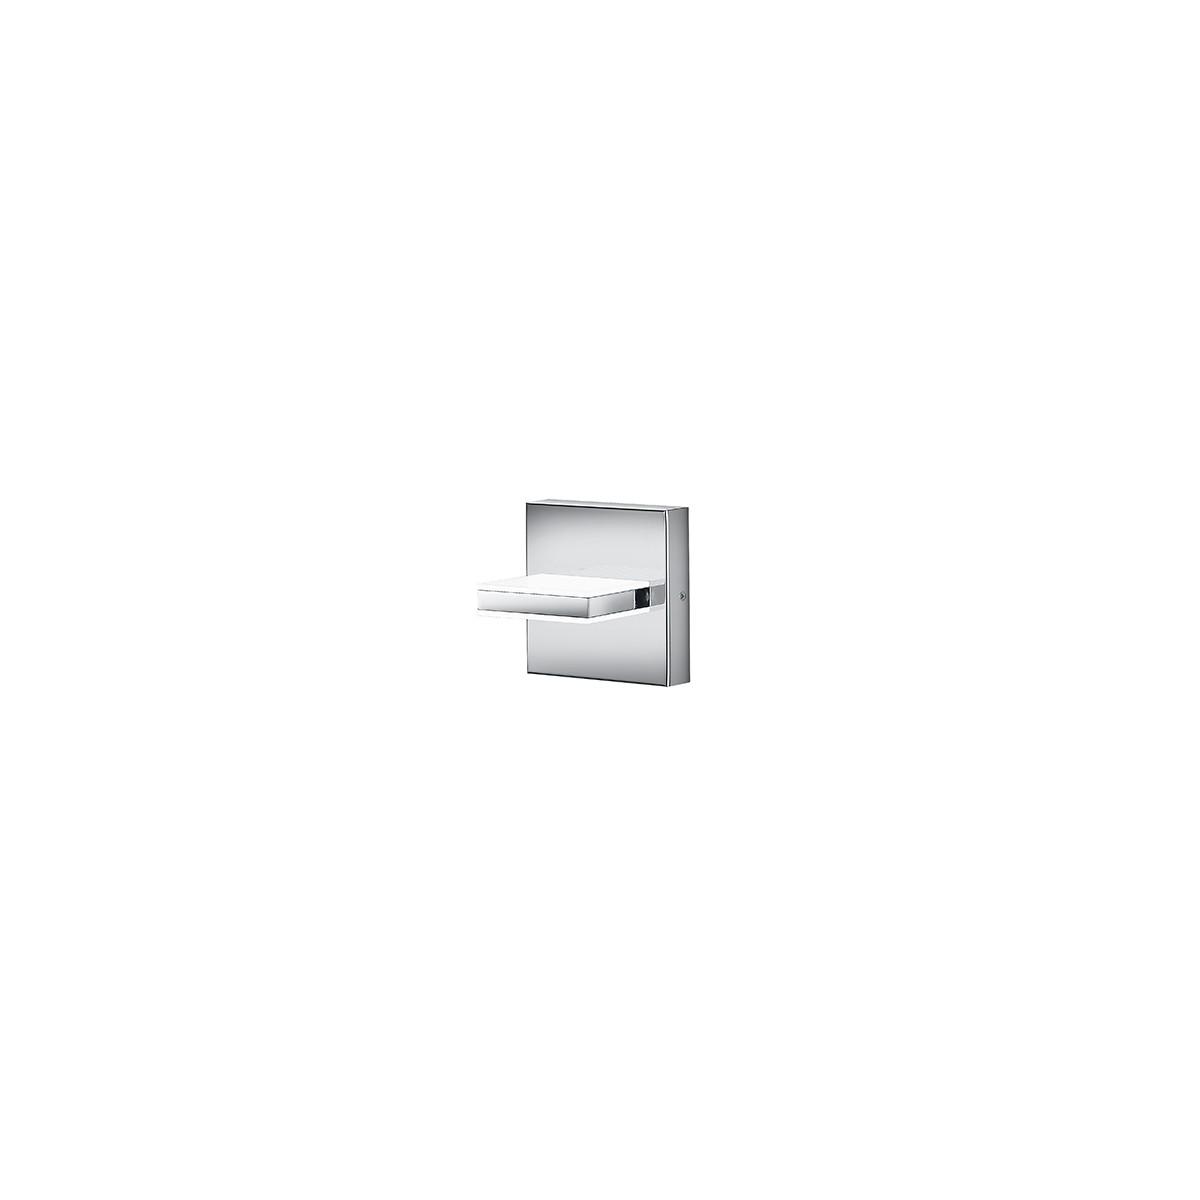 Bankamp Linea Wandleuchte, 13 x 13 cm, Nickel matt / Chrom